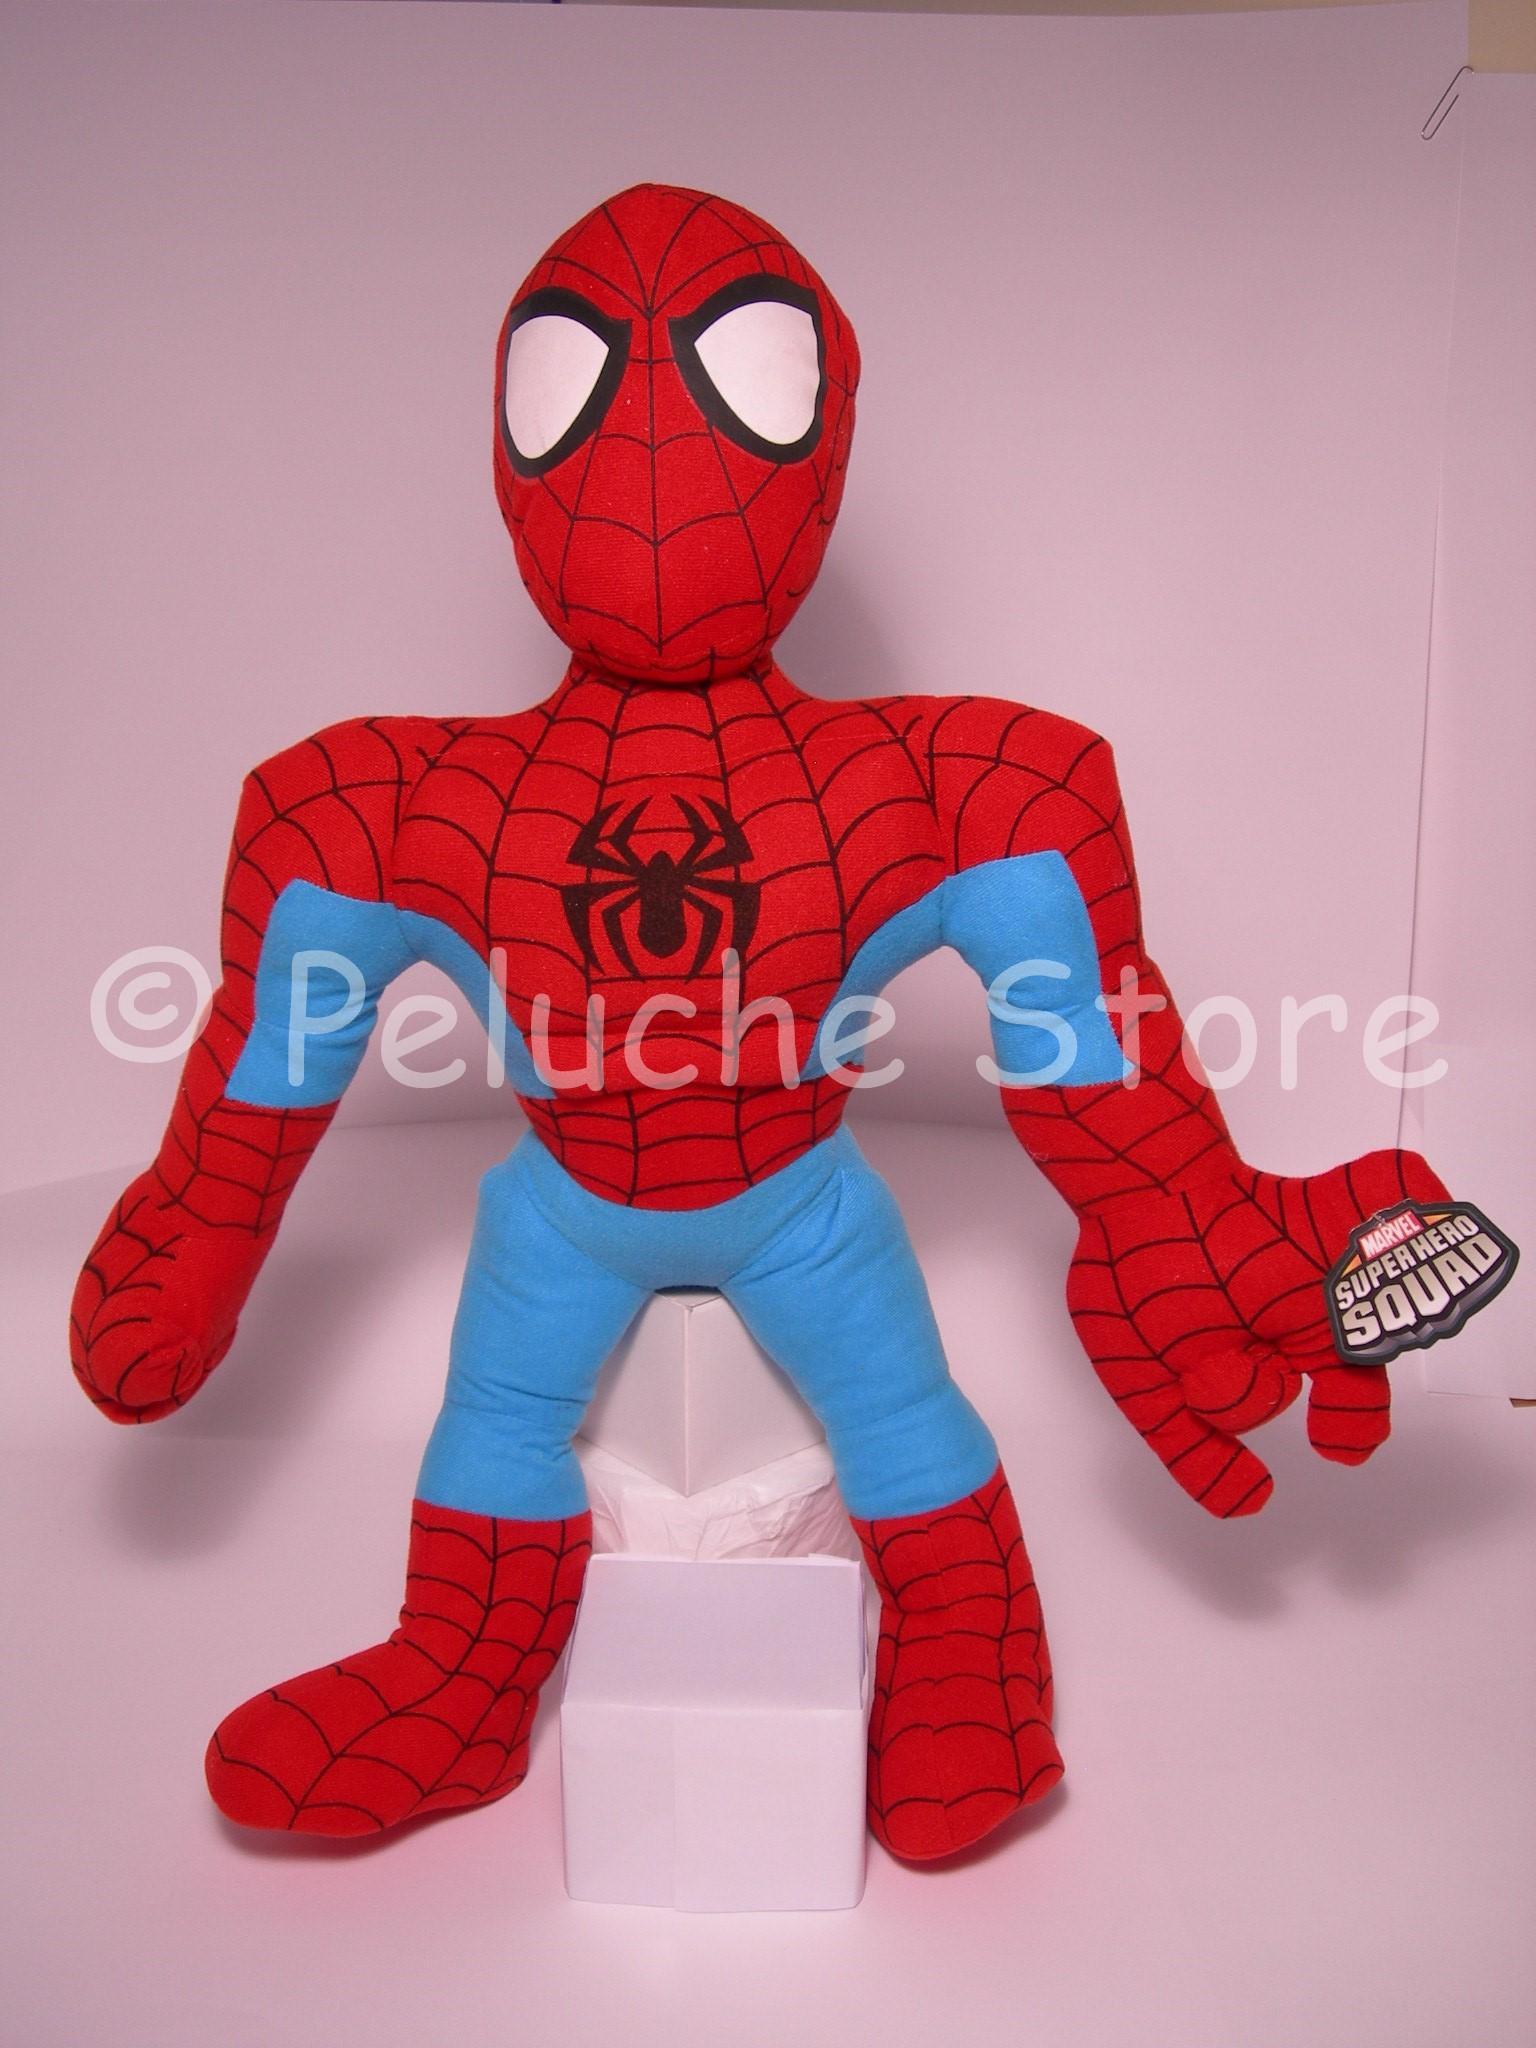 Marvel Avengers Super Heroes Squad peluche Gigante 70 cm Spiderman